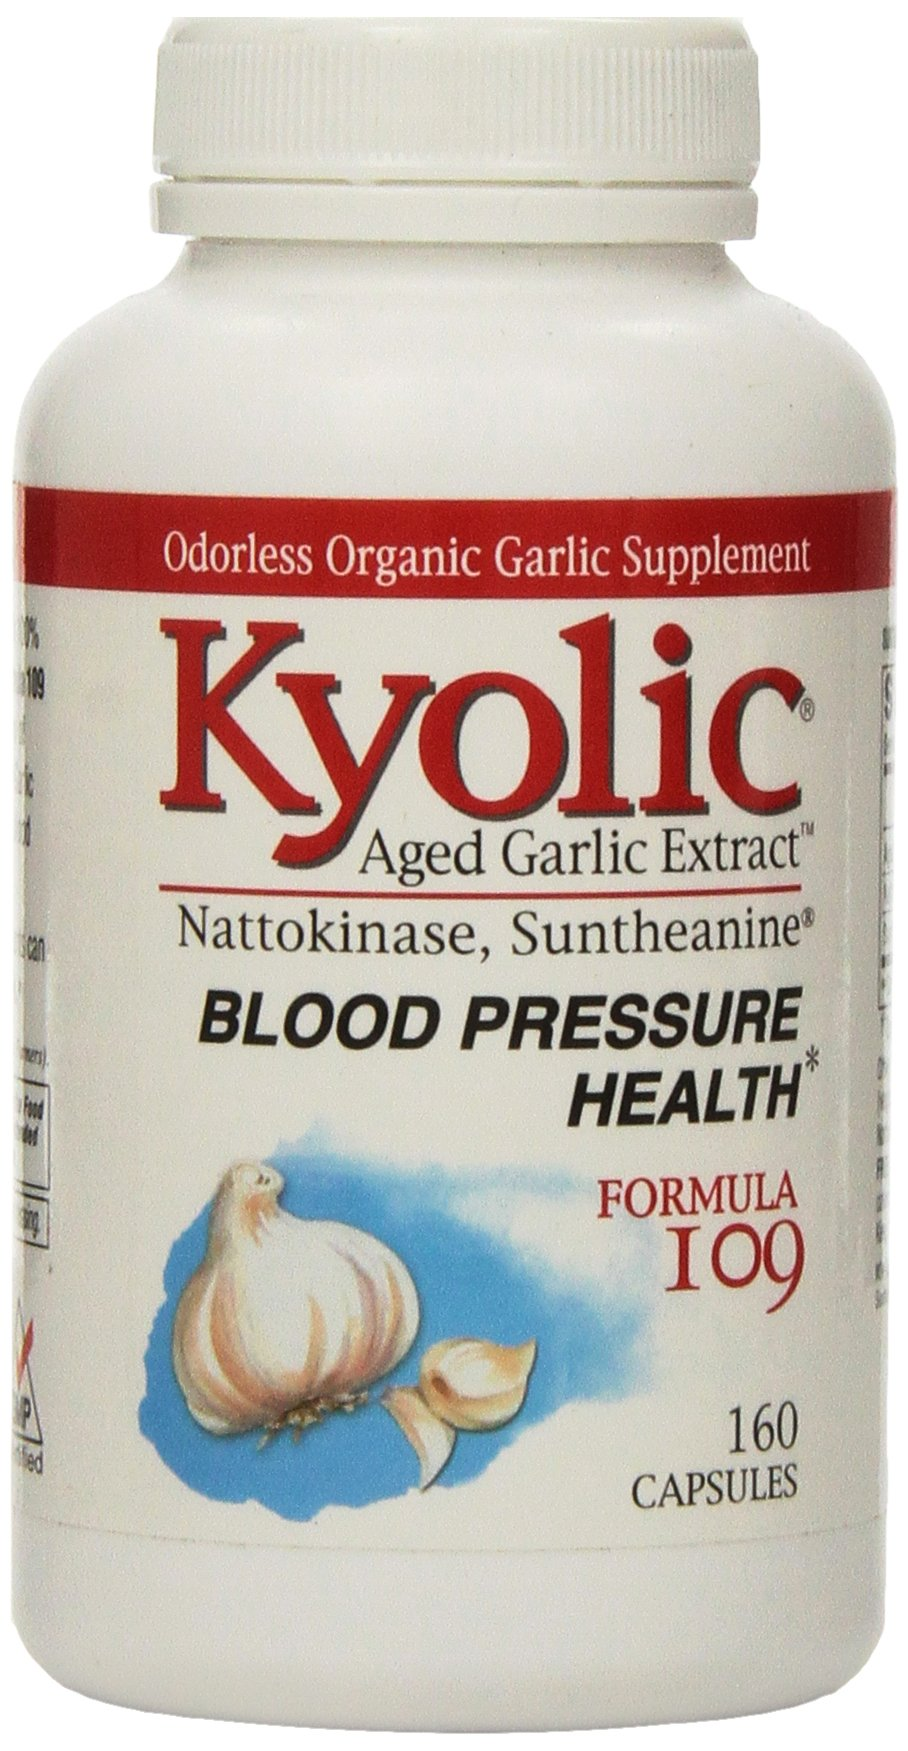 Kyolic Formula 109 Aged Garlic Extract Blood Pressure Health (160-Capsules)